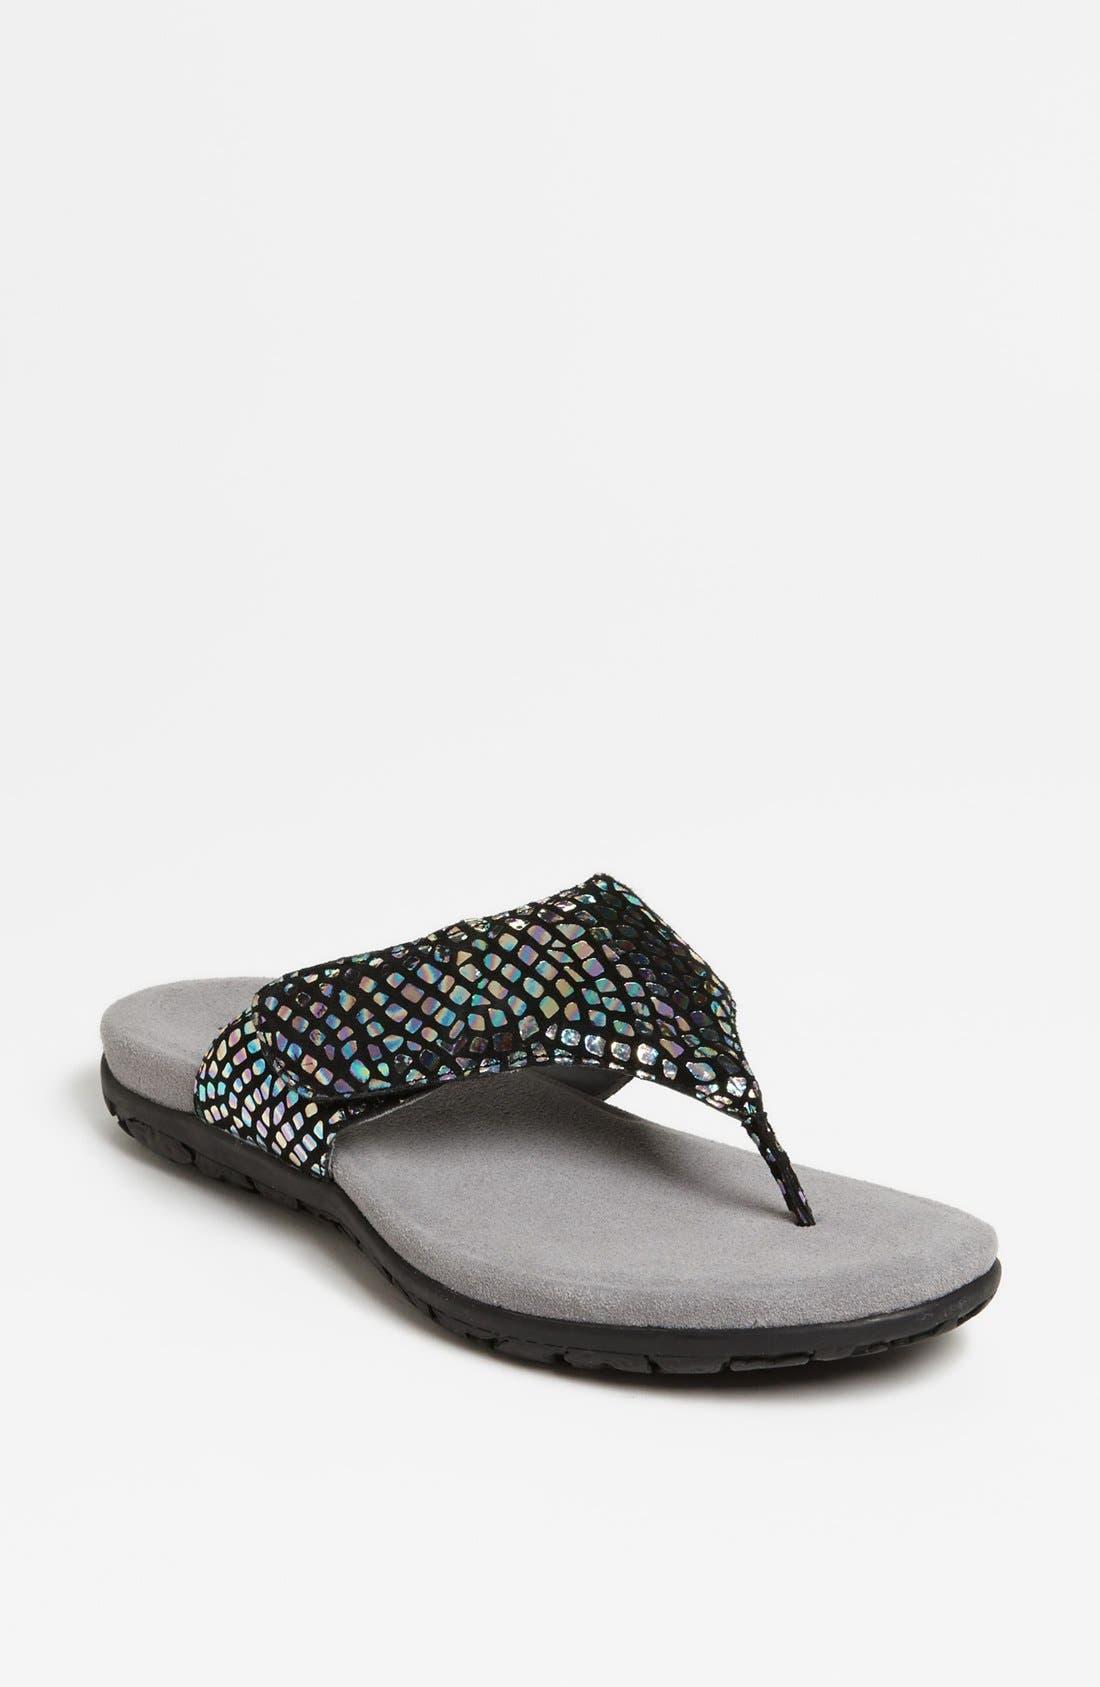 Main Image - Alegria 'Molly' Sandal